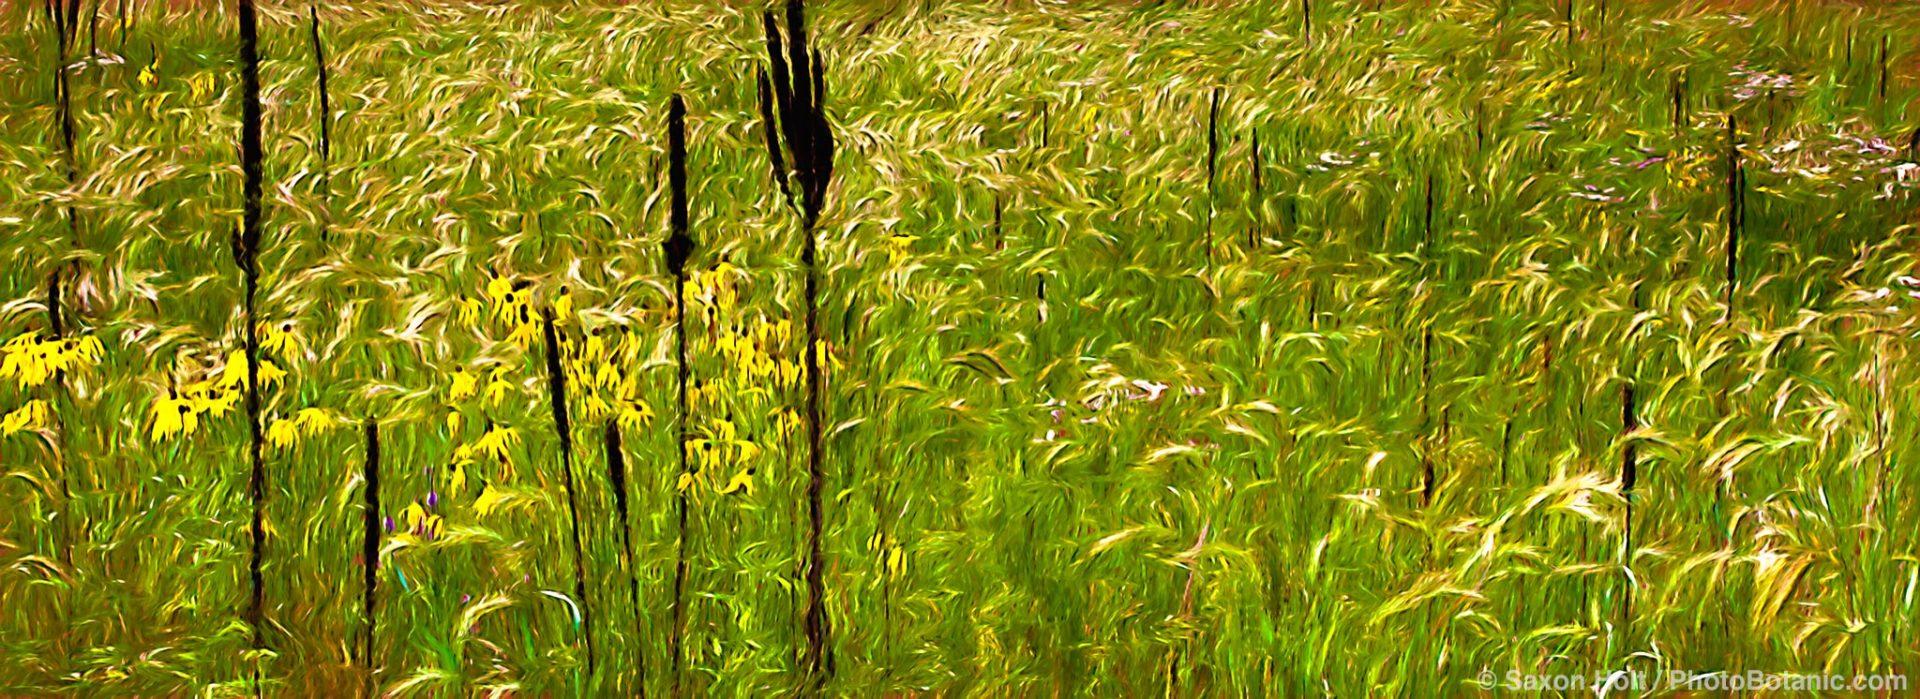 Dried flower stalks of Common Mullein (Verbascum thapsus ) framing Canada Rye grass (Elymus canadensis) and yellow flower Gray Coneflower (Ratibida pinnata) in Crow-Hassan Park, prairie reserve